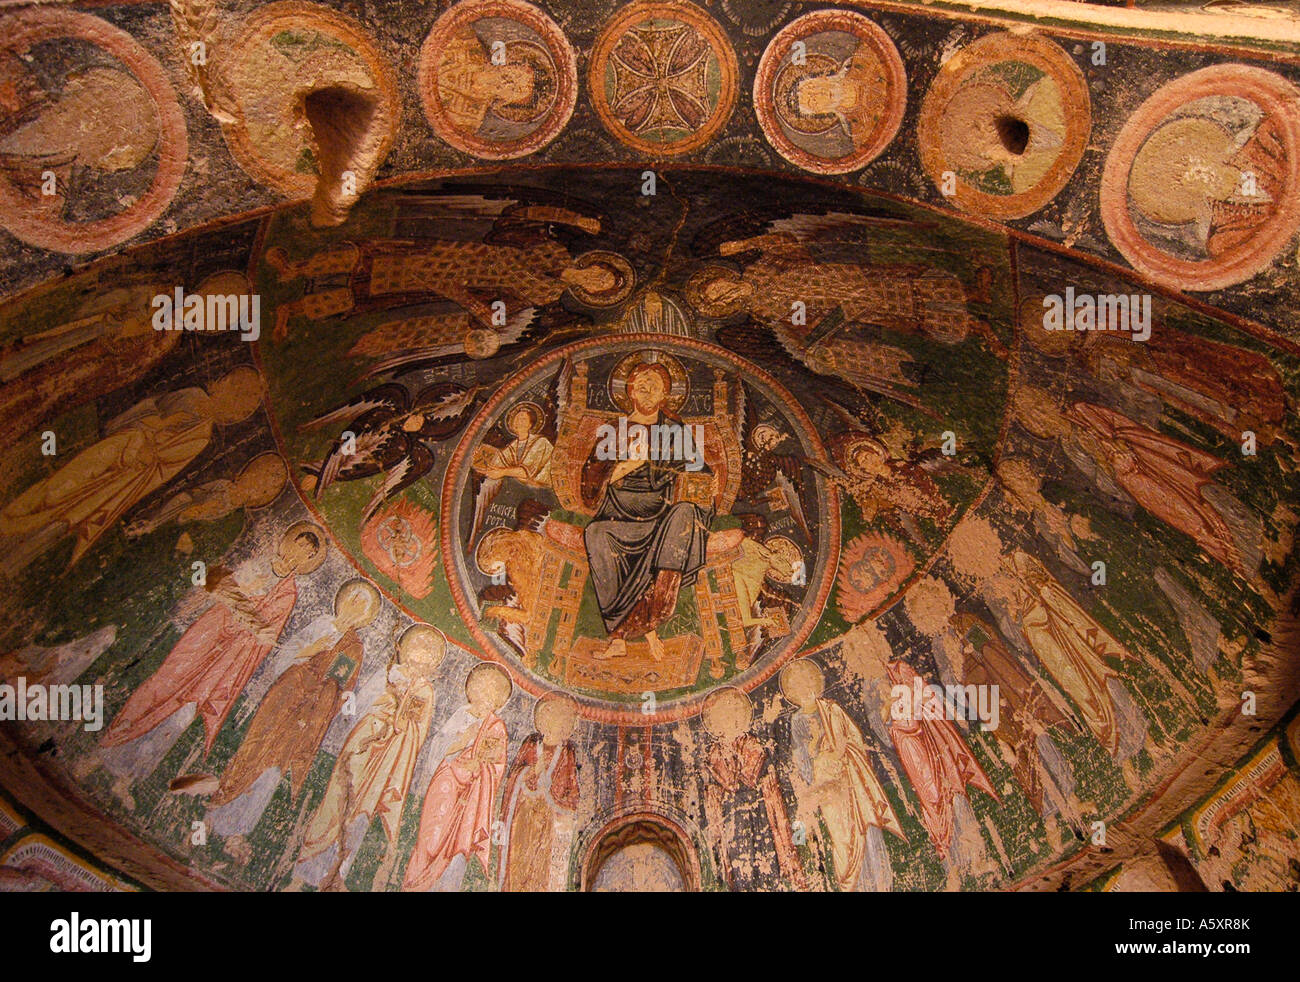 Ancient christian mural ceiling paintings in a troglodyte church in Cappadocia, near Goreme, Turkey. - Stock Image